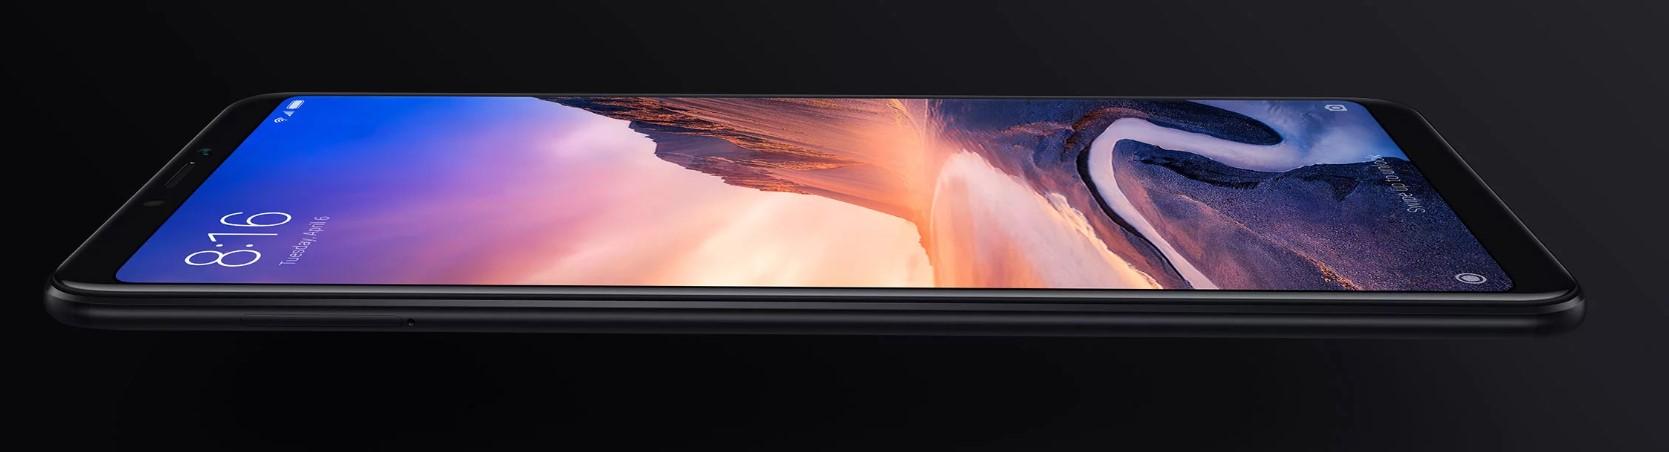 Mi Max 3 ekran